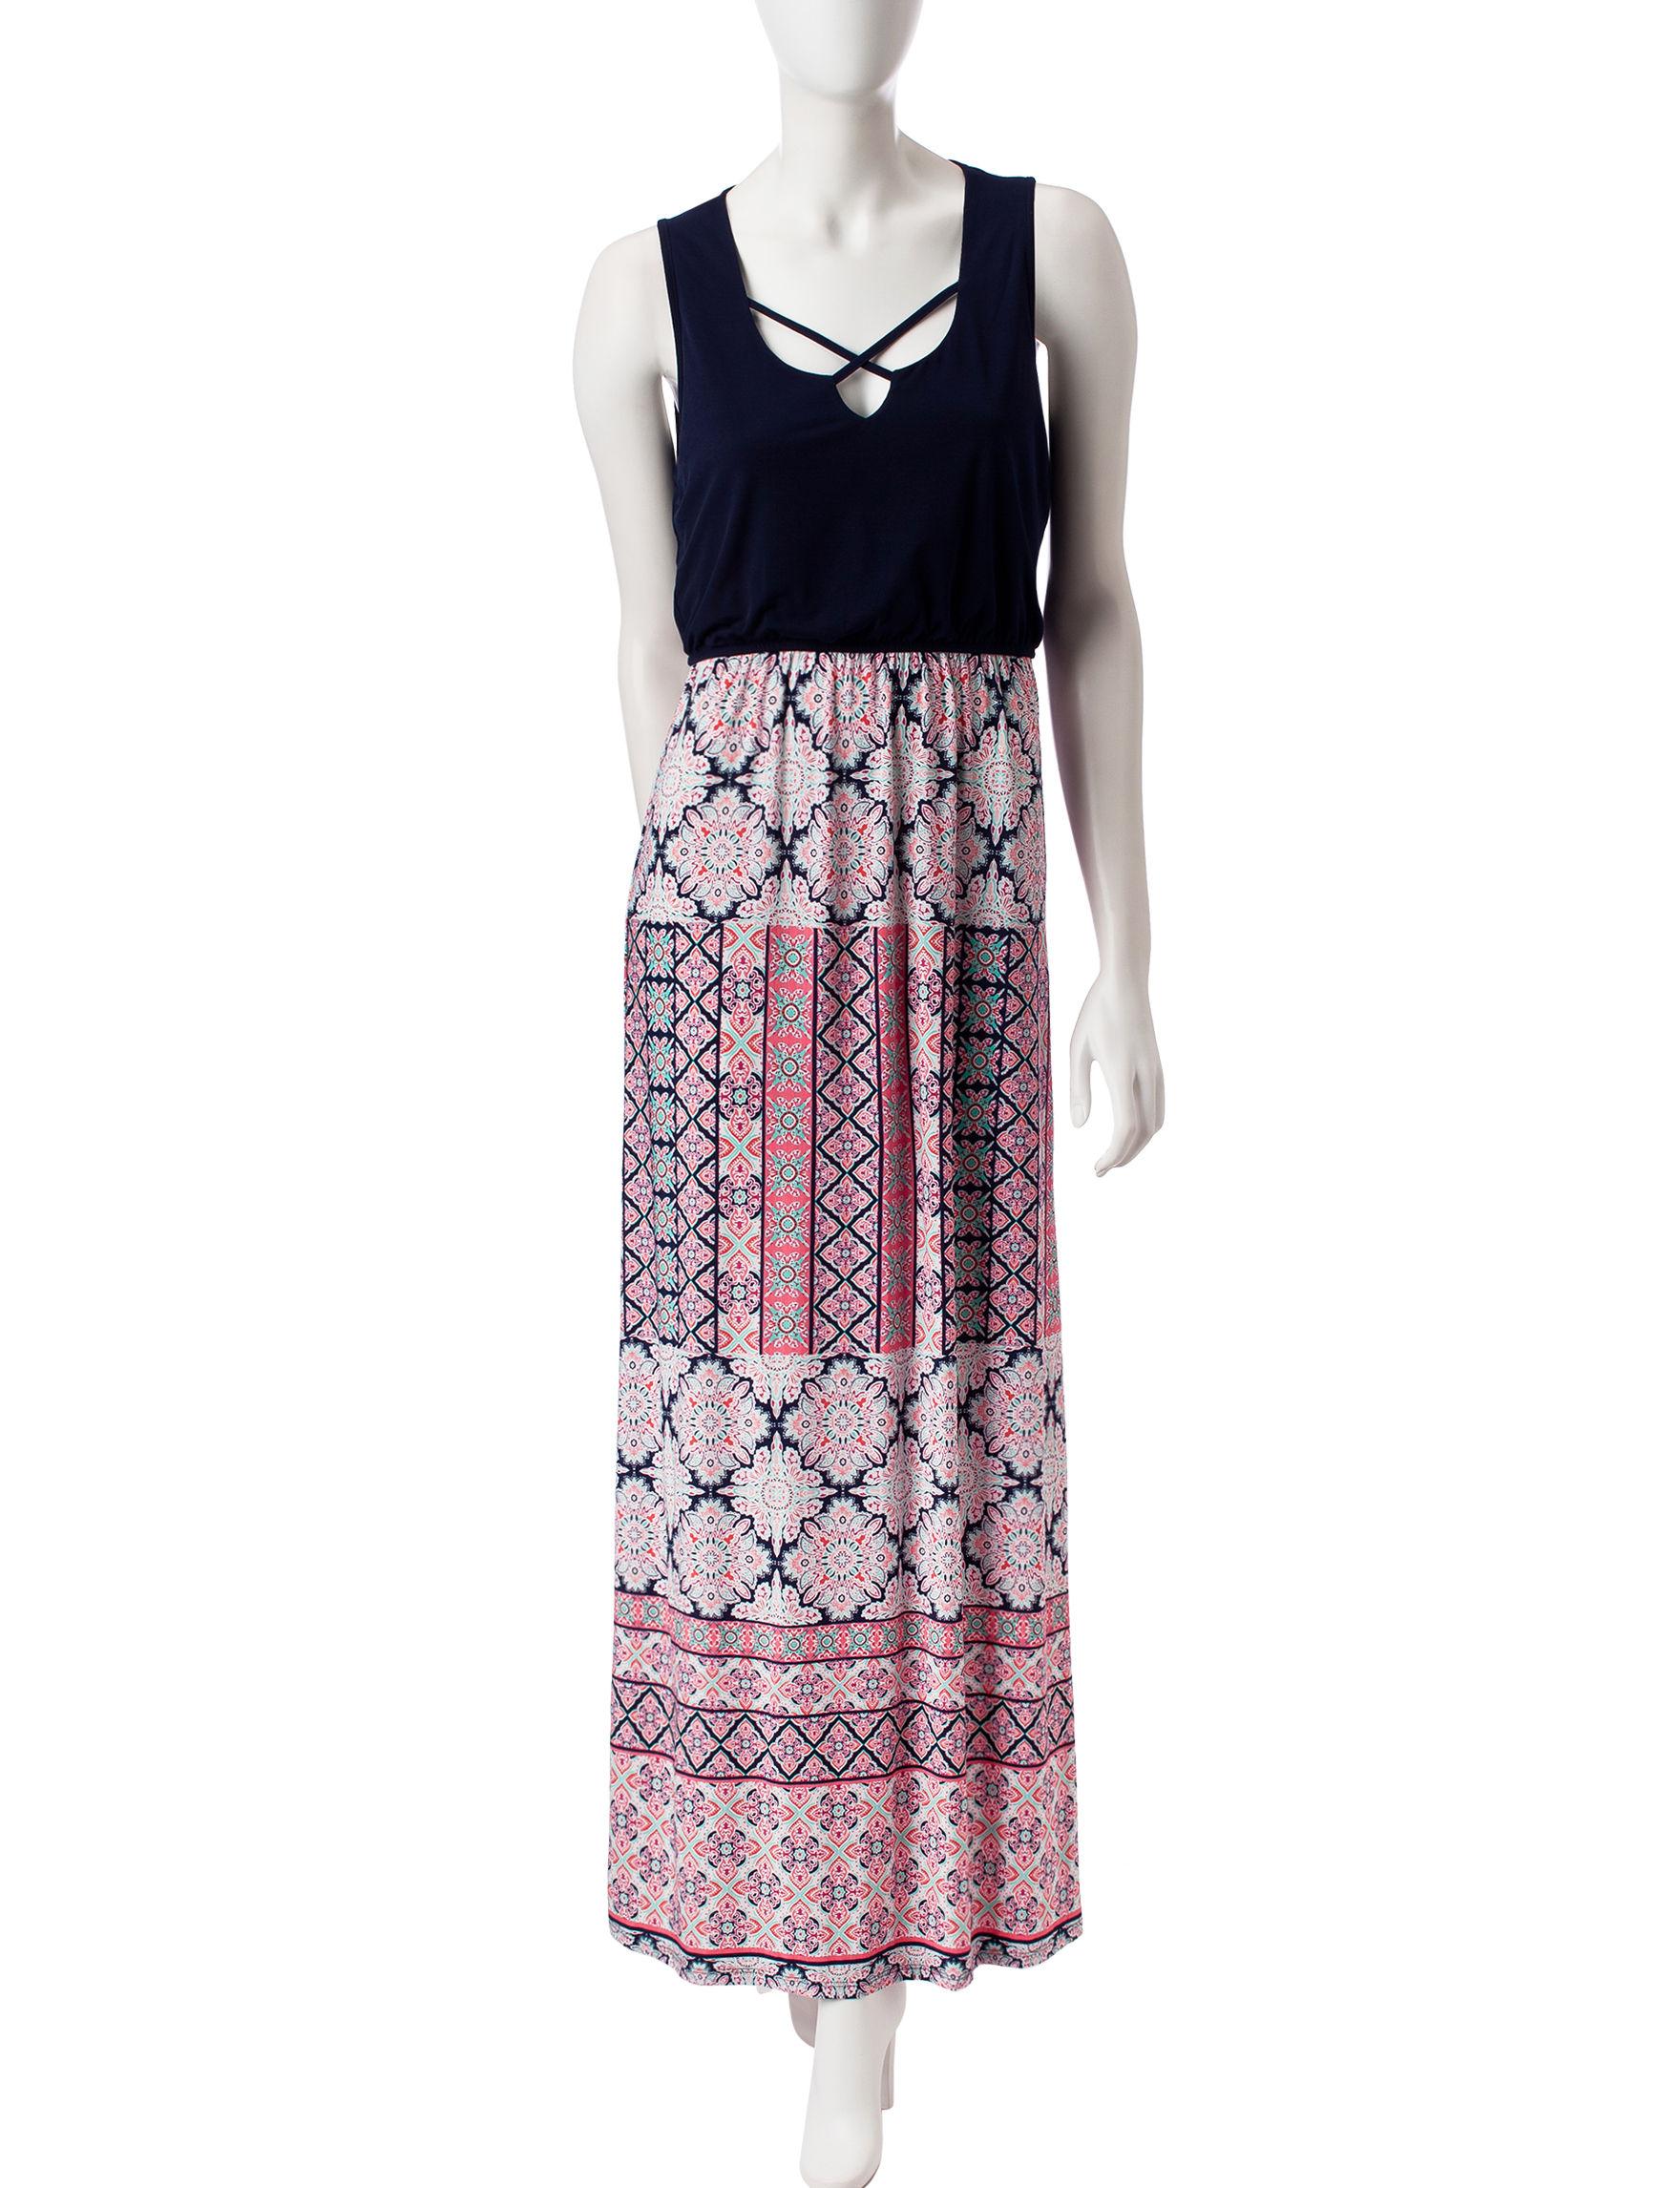 Trixxi Black / Fuschia Everyday & Casual Shift Dresses Sundresses